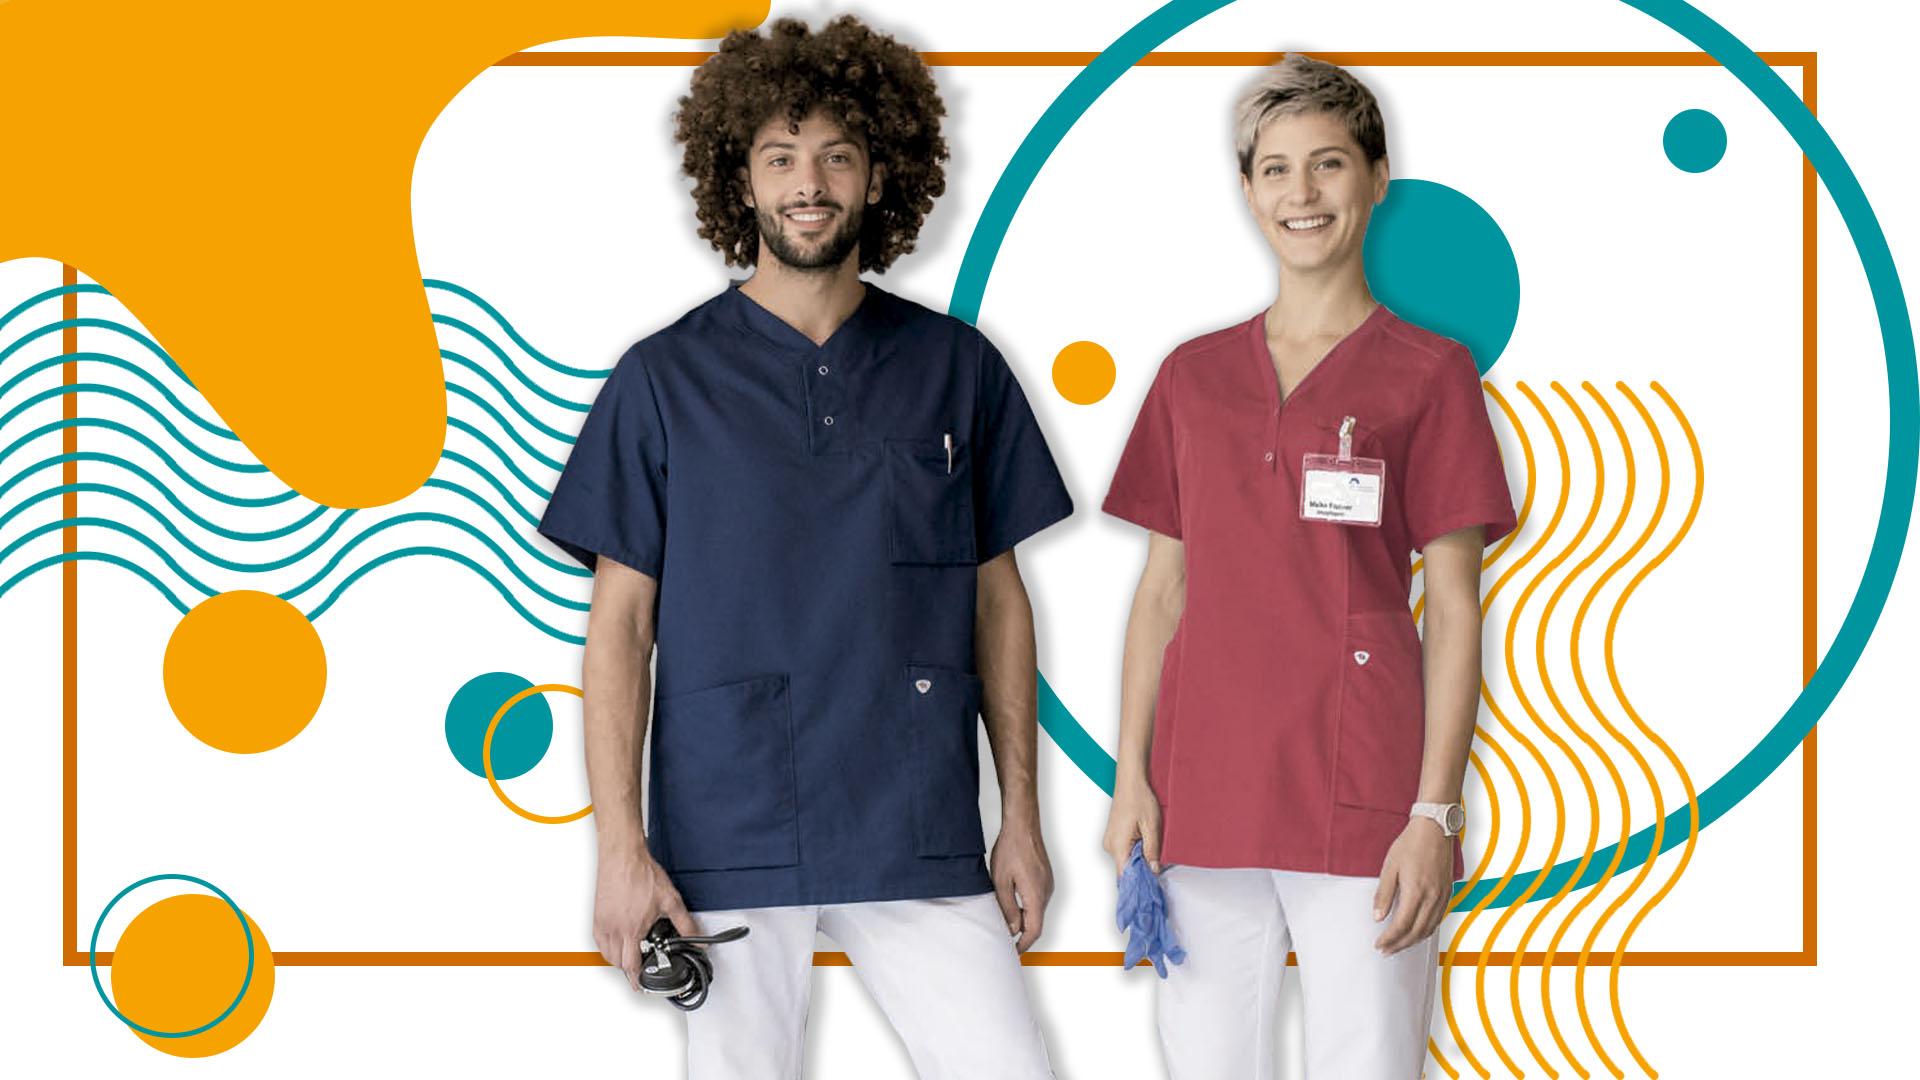 uniforme Sanidad BP